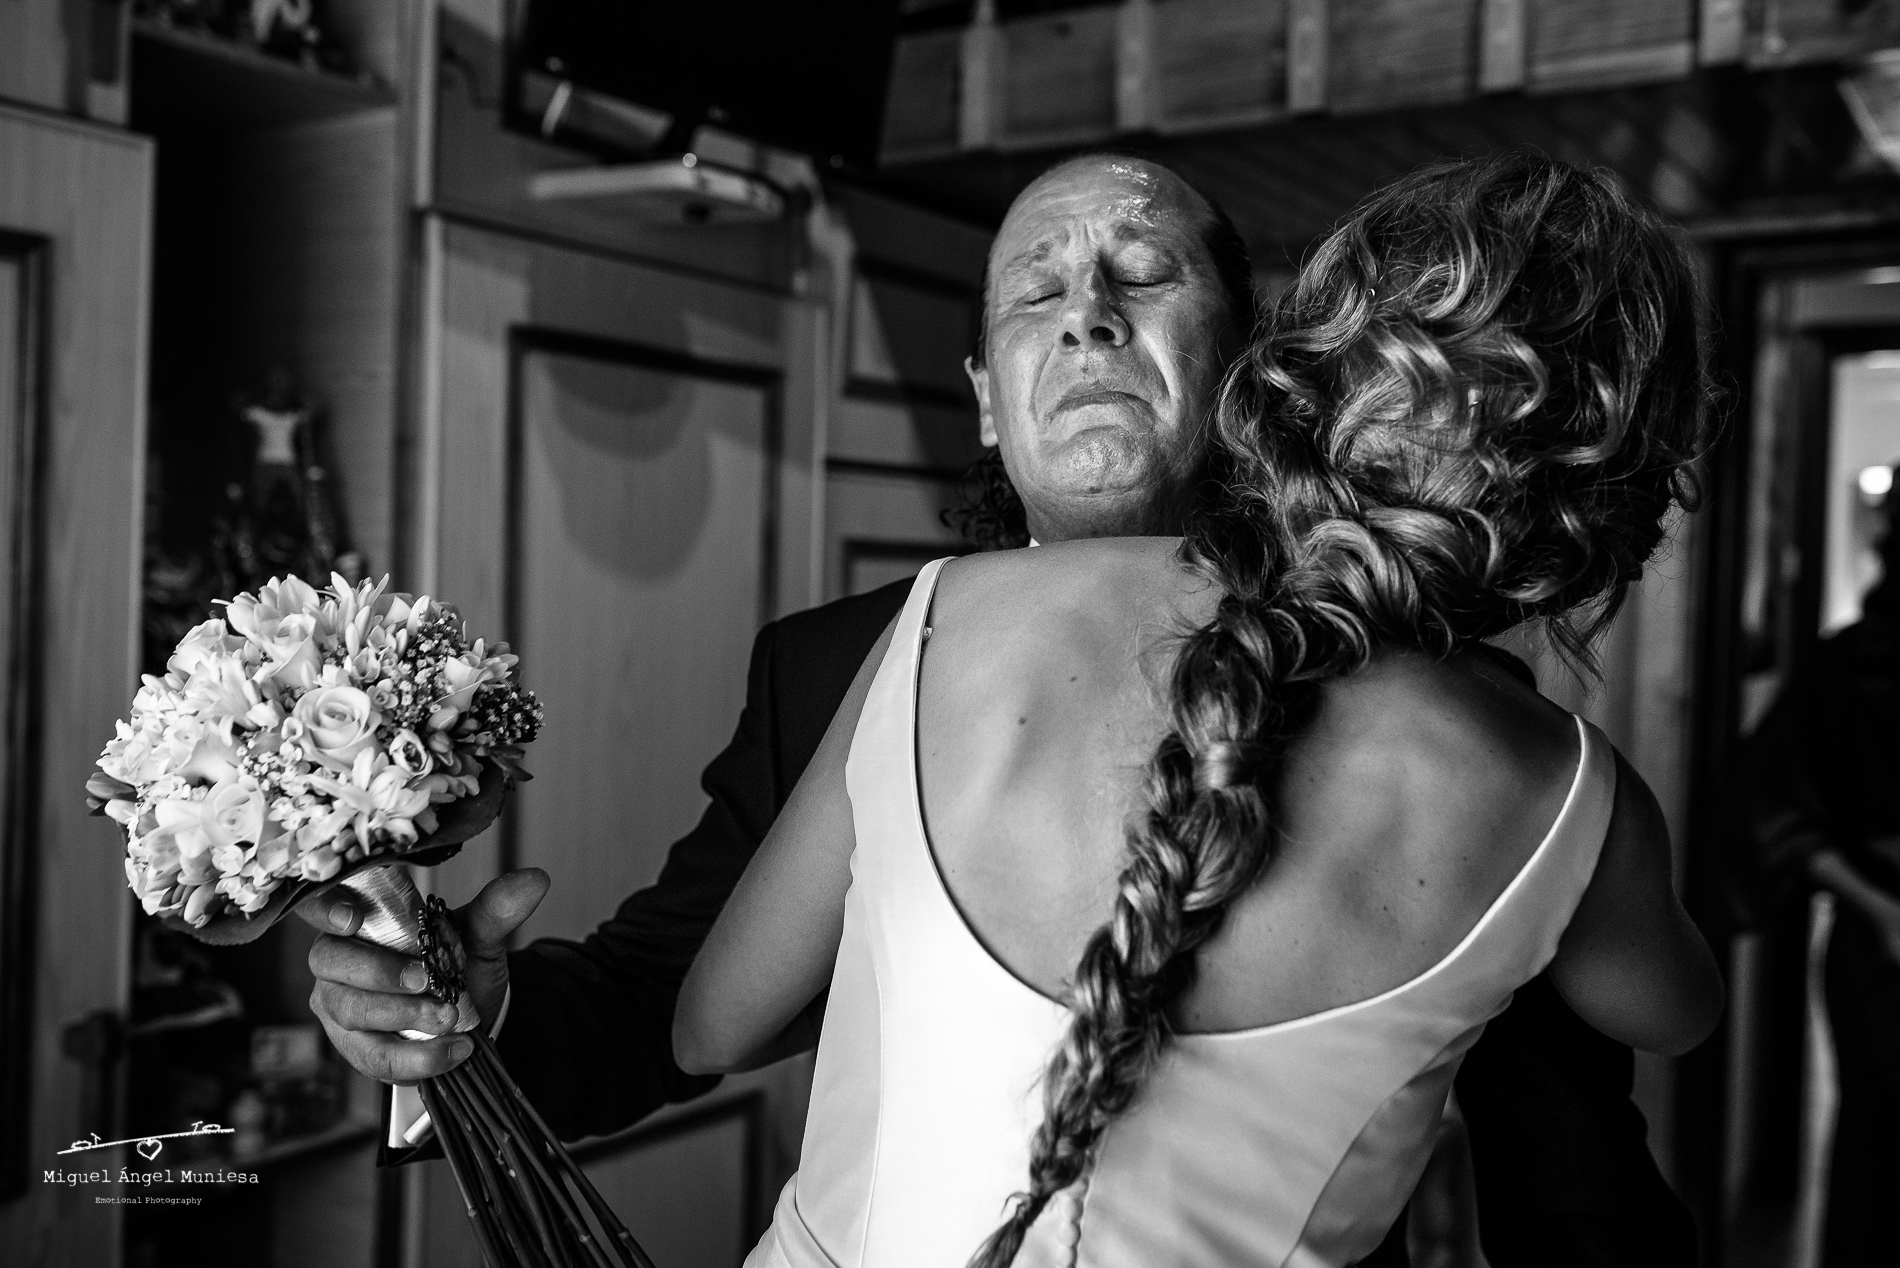 boda, fotografia de boda, boda zaragoza, fotografia, wedding, wedding photography, miguel angel muniesa, fotografo boda Zaragoza, fotografo boda, destination wedding_ 019